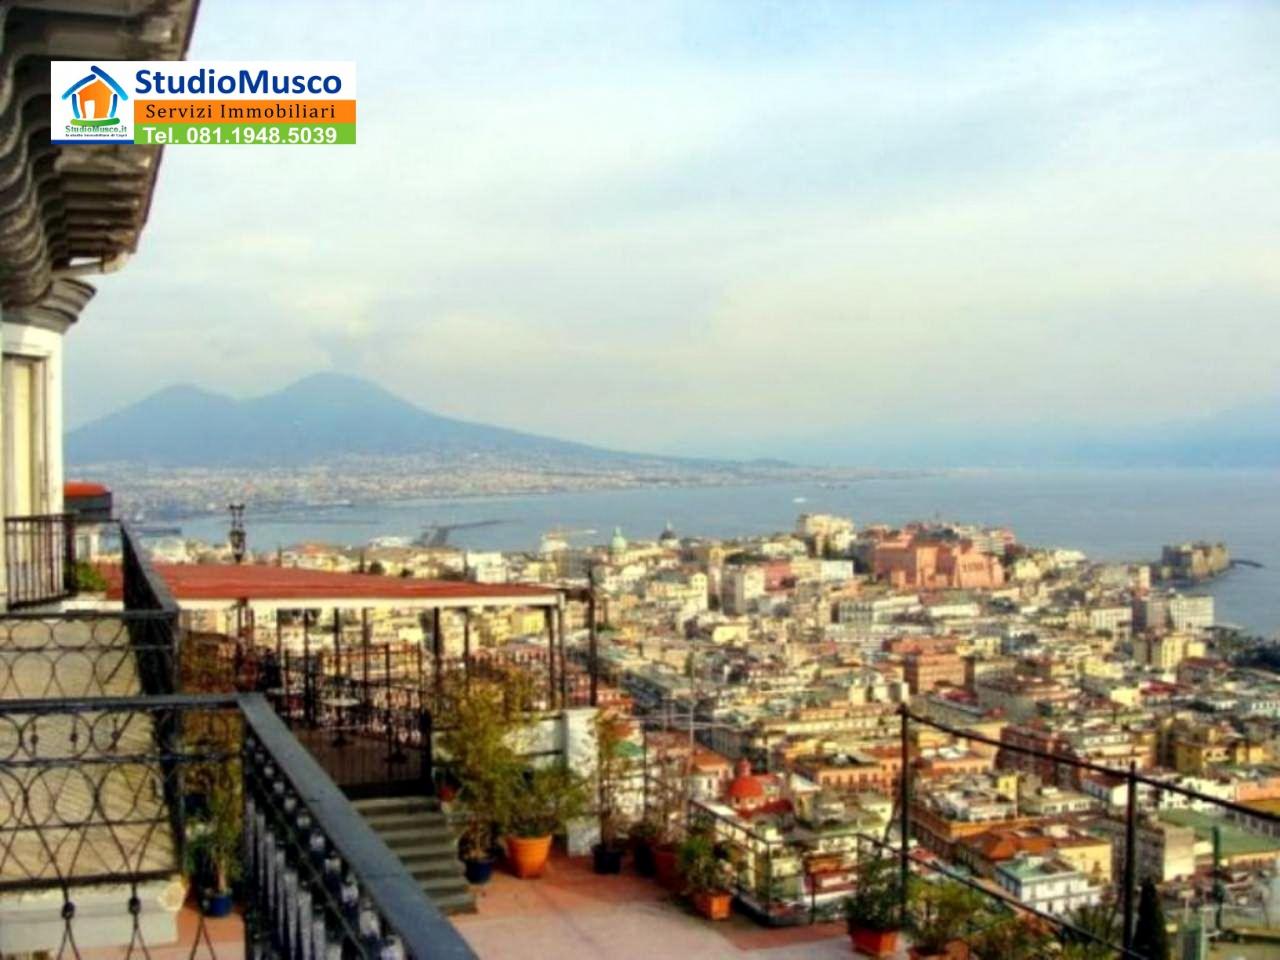 cerca Napoli  Chiaia / Mergellina APPARTAMENTO VENDITA